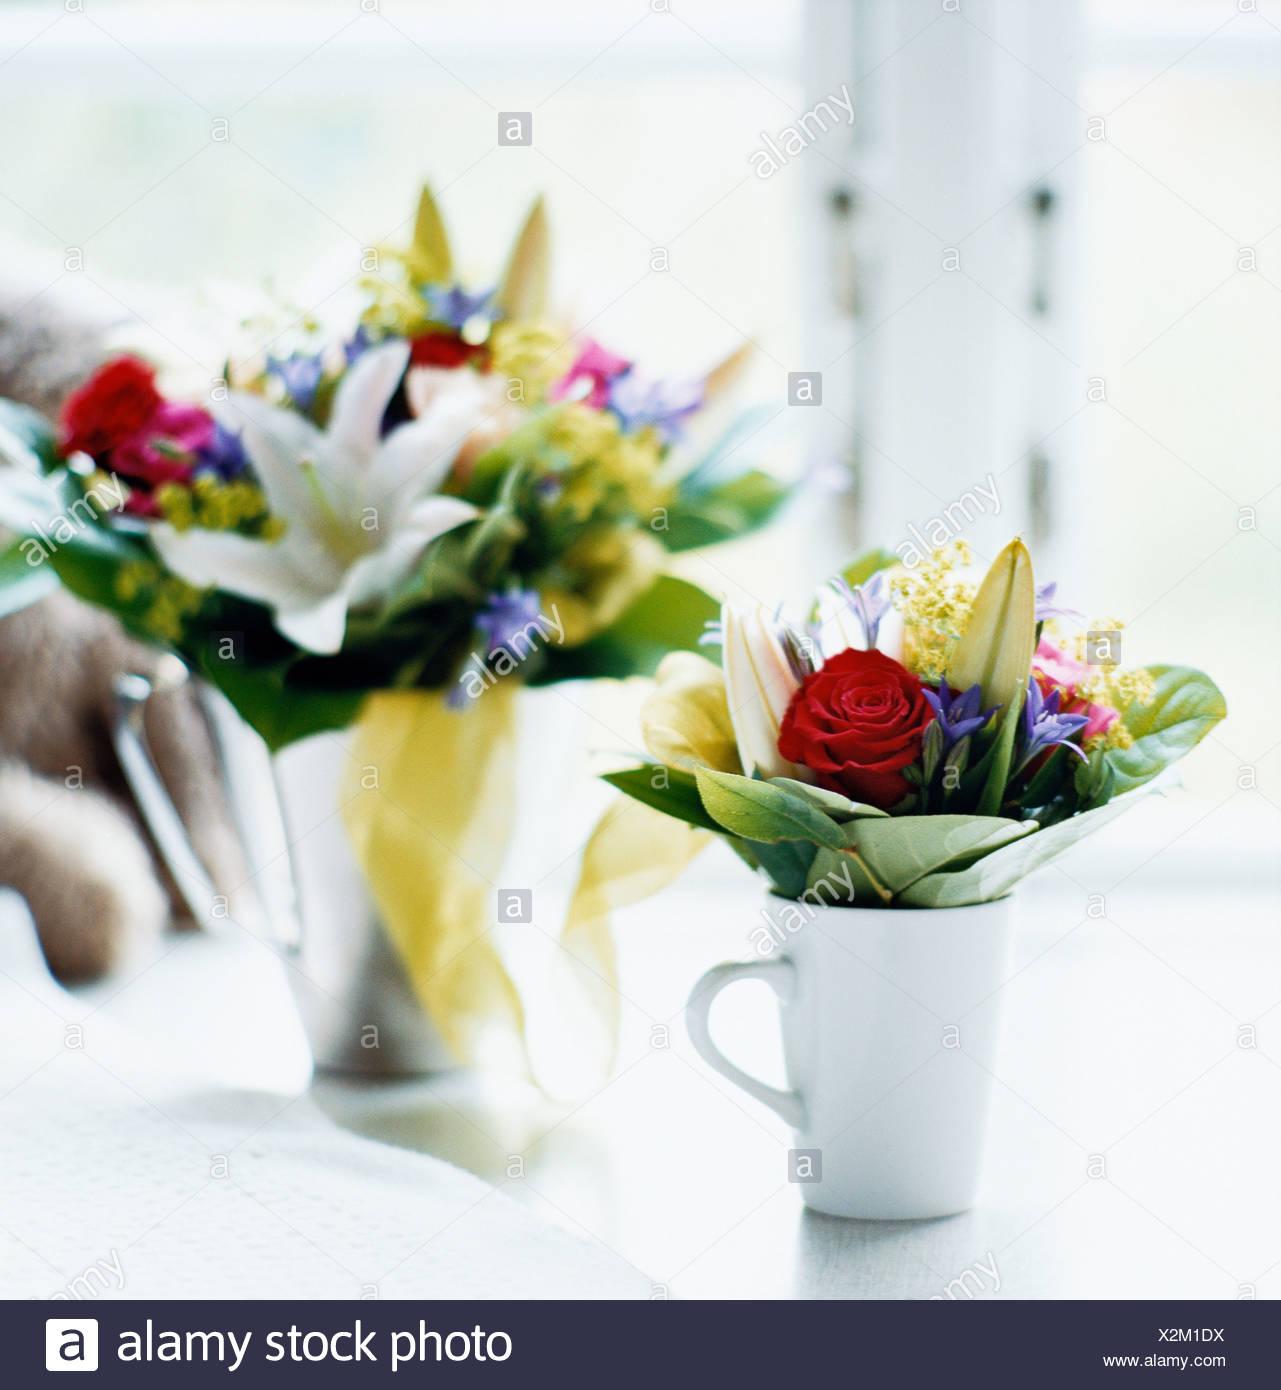 Big Flower Vase Stock Photos Big Flower Vase Stock Images Alamy